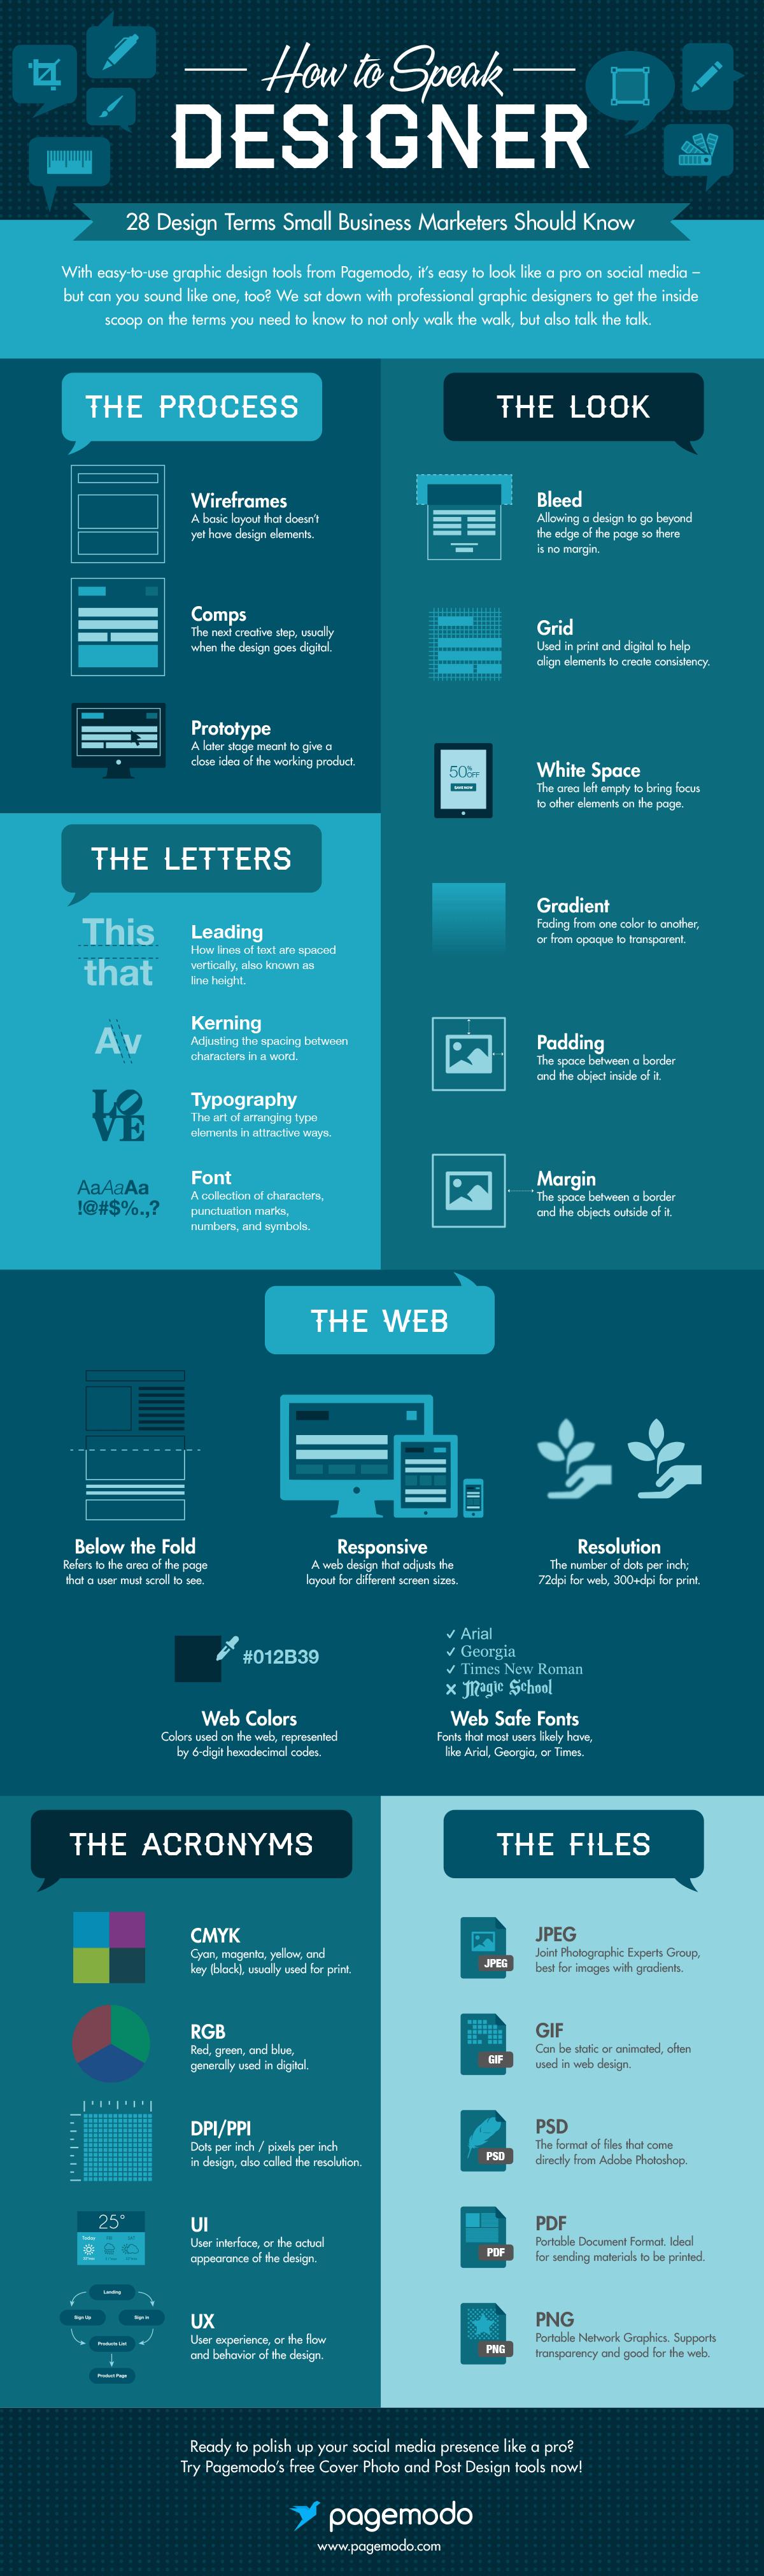 PageModo-How-to-Speak-Designer-Infographic.png